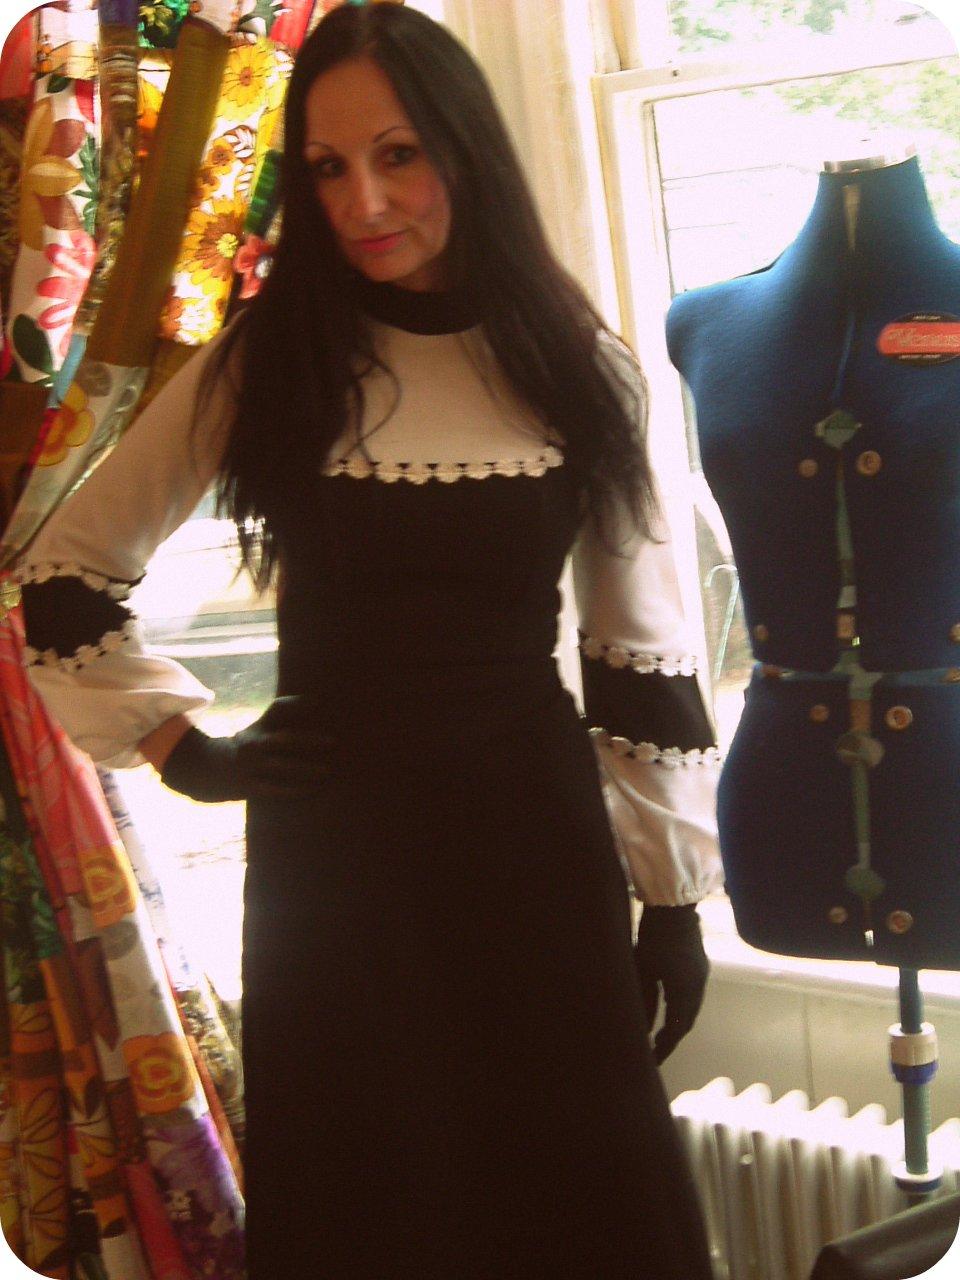 Vintage Vixen: 09/2010